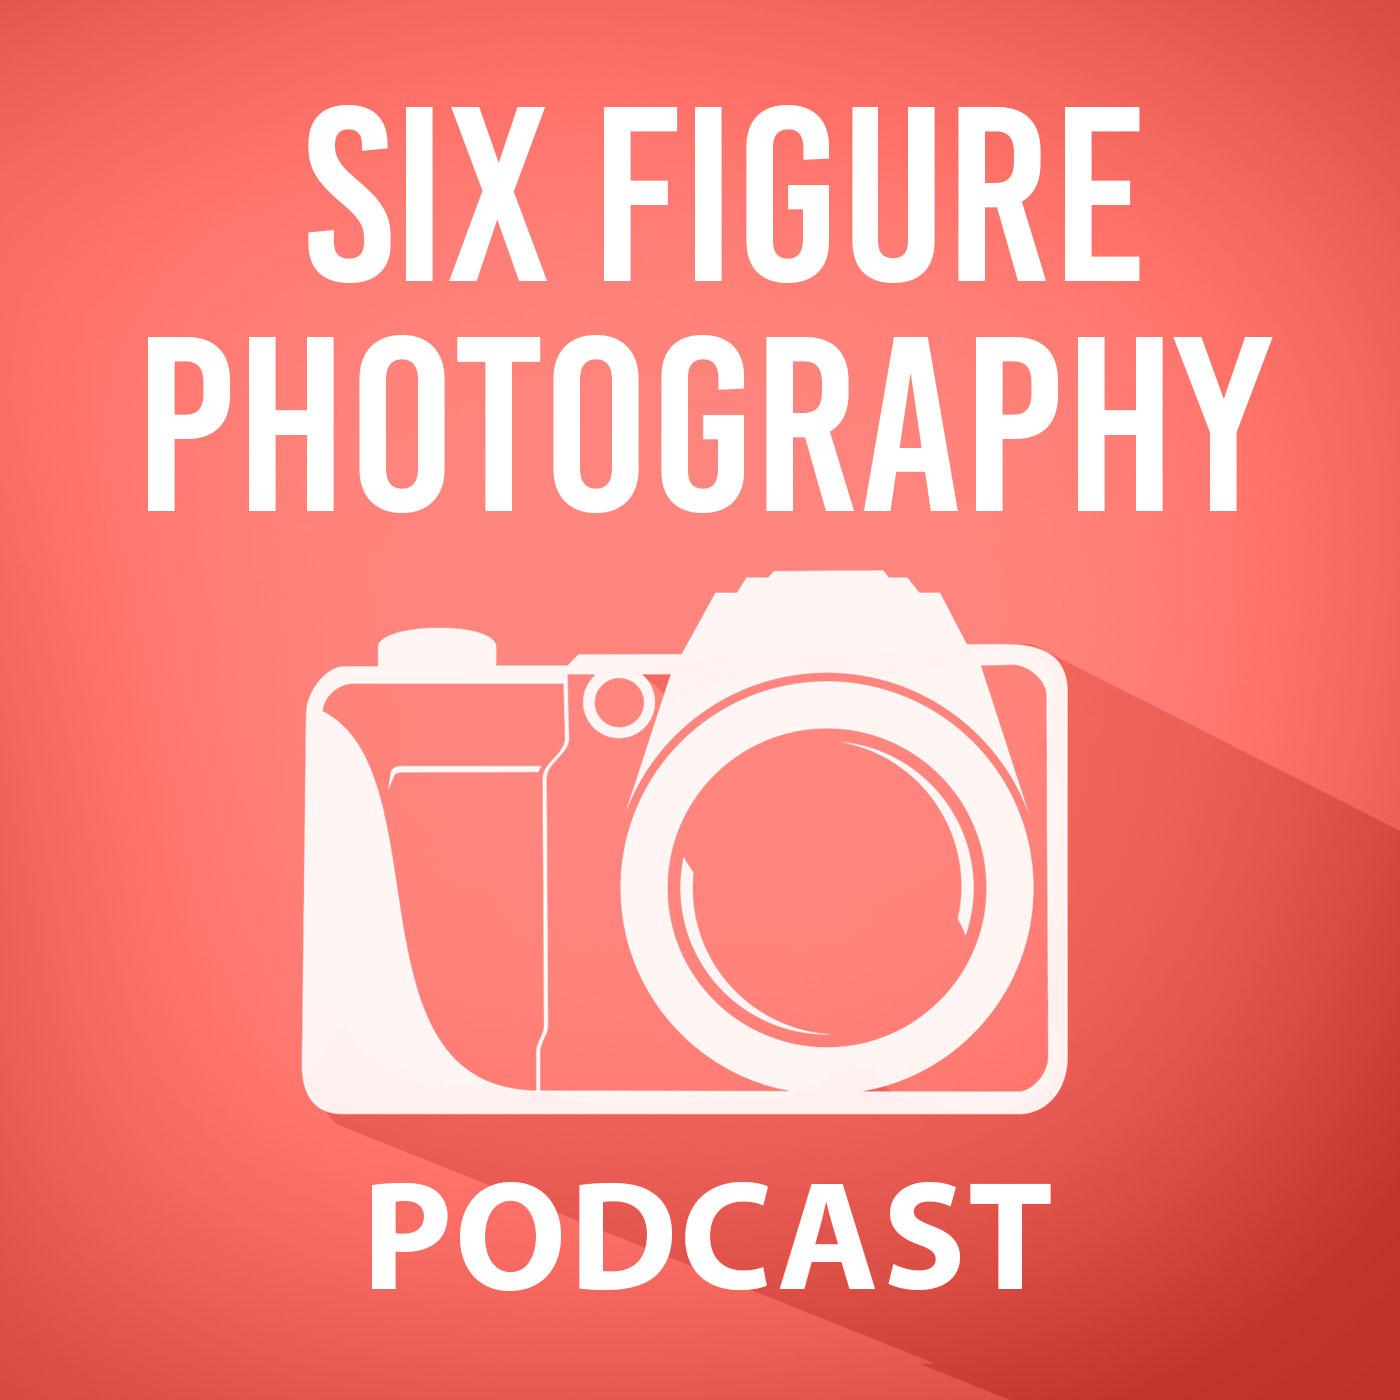 Six Figure Photography Podcast